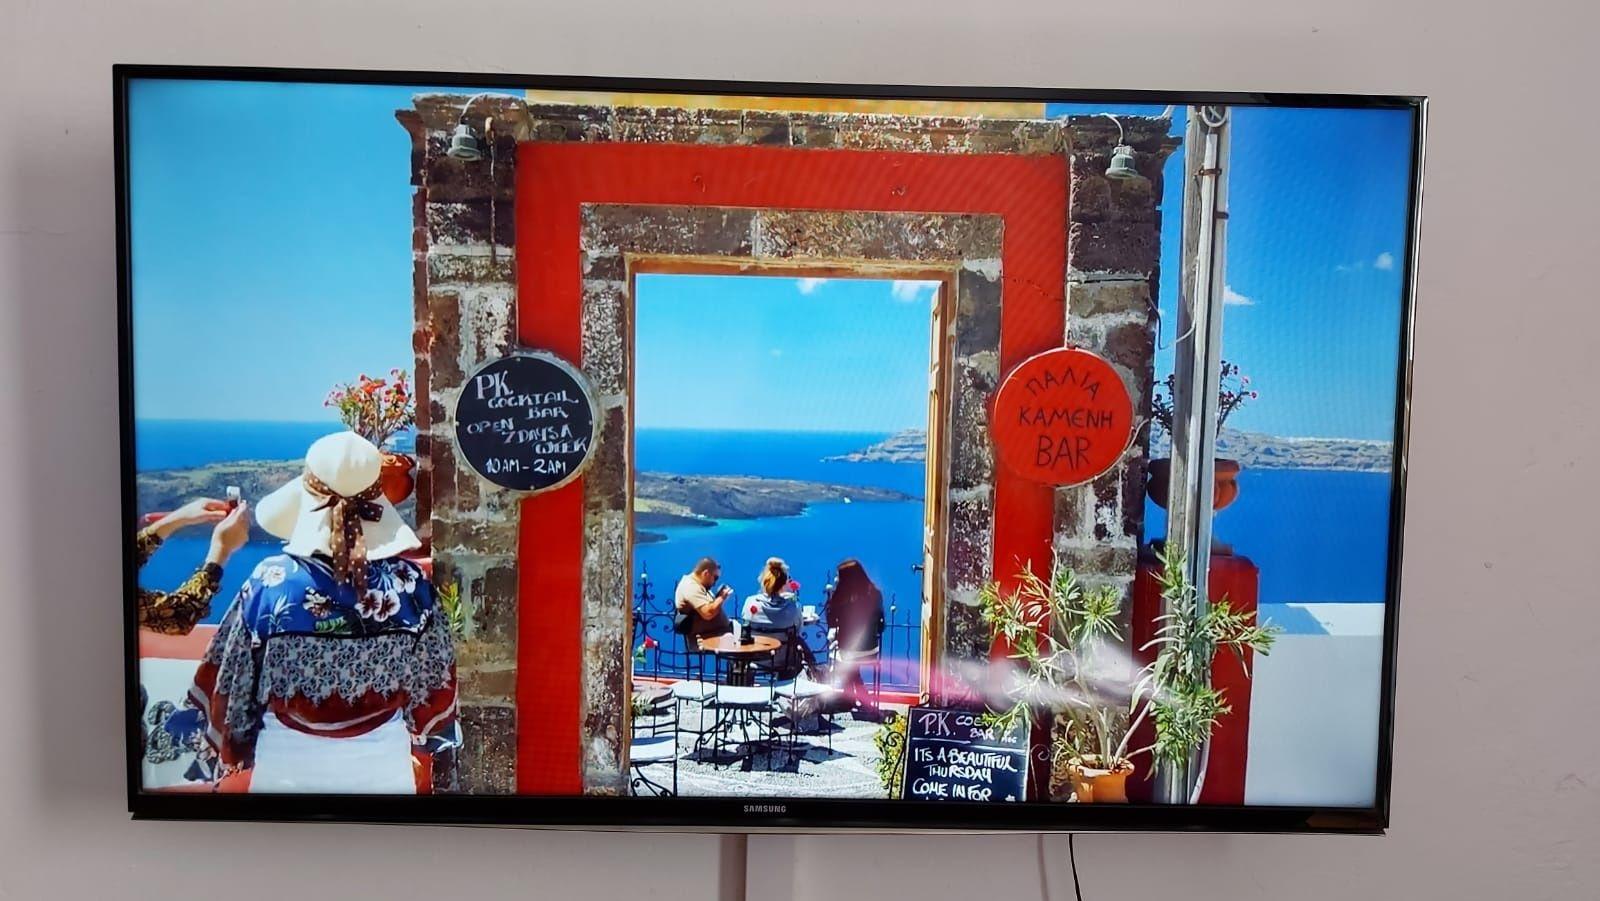 Tv Lcd Samsung  101 cm